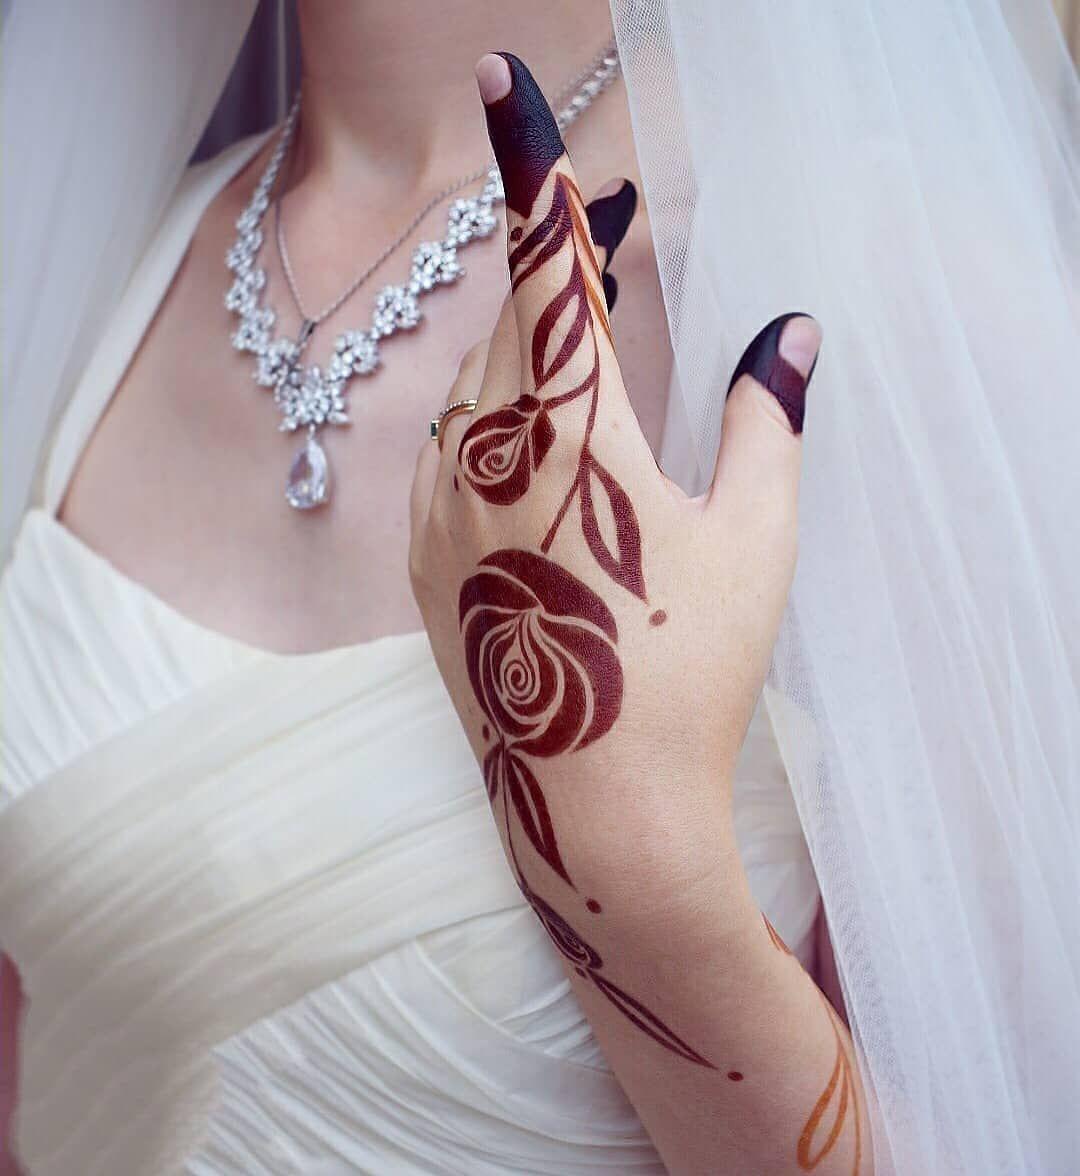 Queen Of Words On Instagram Henna Aafi Writes Dpz Hennatattoo Hennadesign Mehndi Rose Mehndi Designs Mehndi Designs Mehndi Designs For Beginners